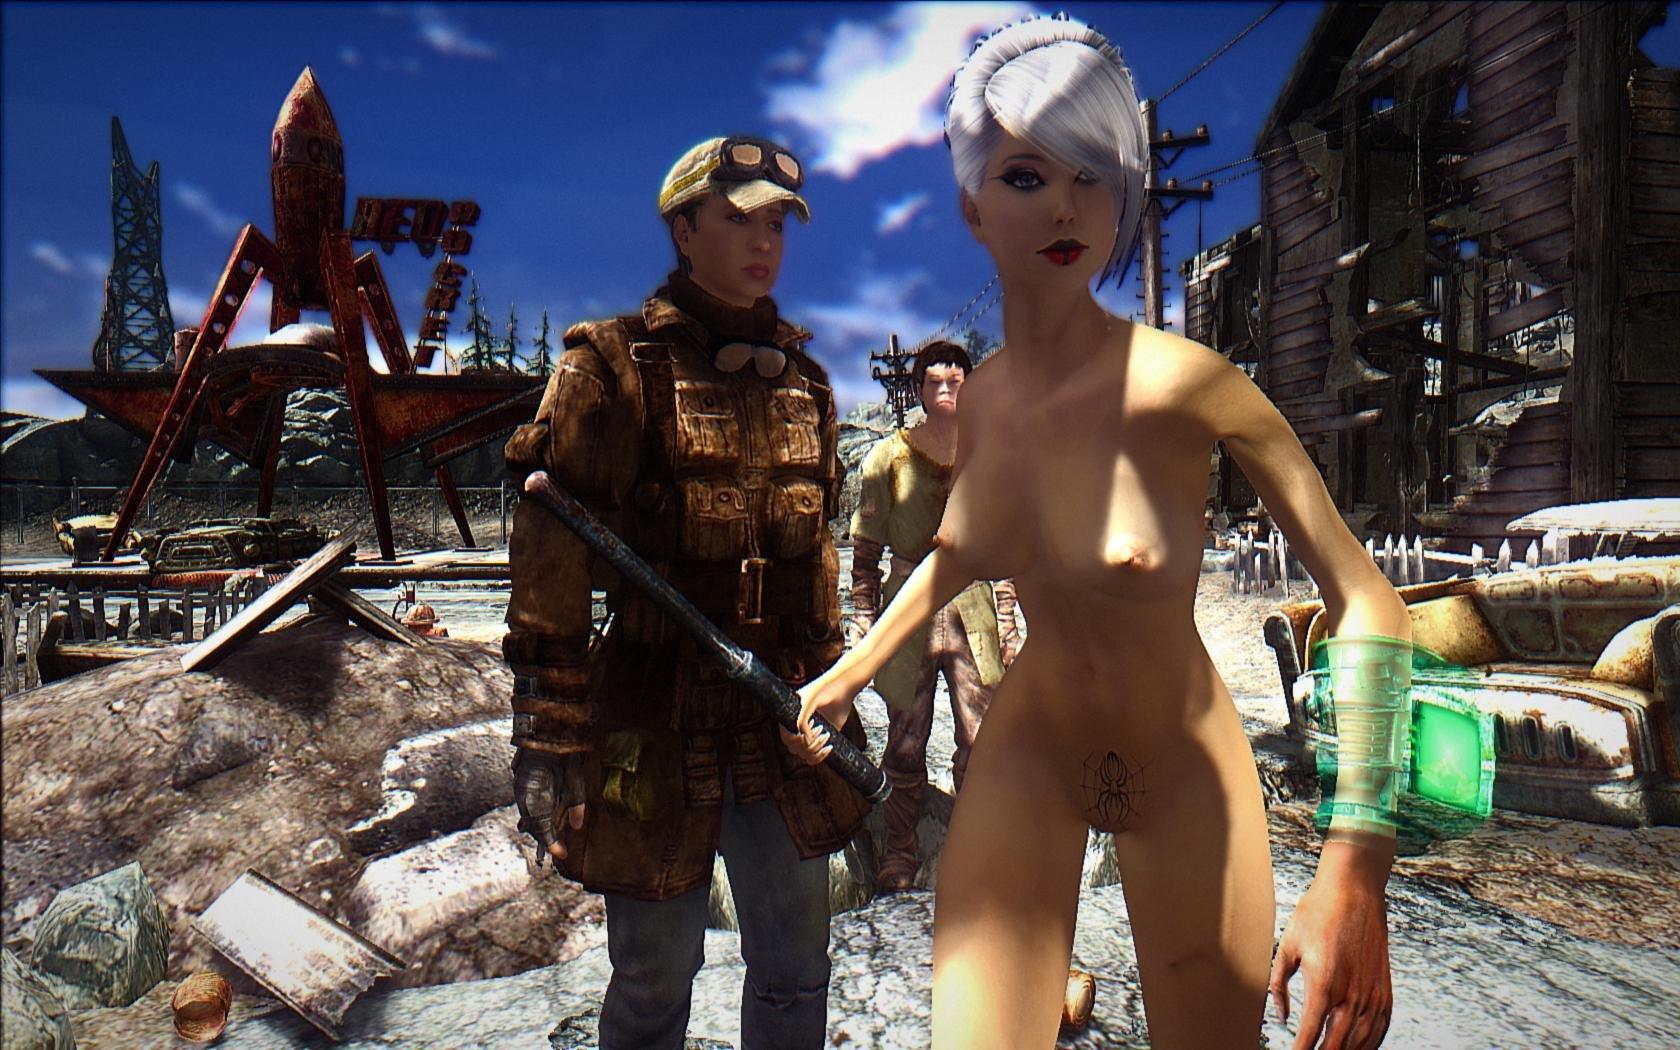 Fallout3 2018-10-19 18-20-01-98.jpg